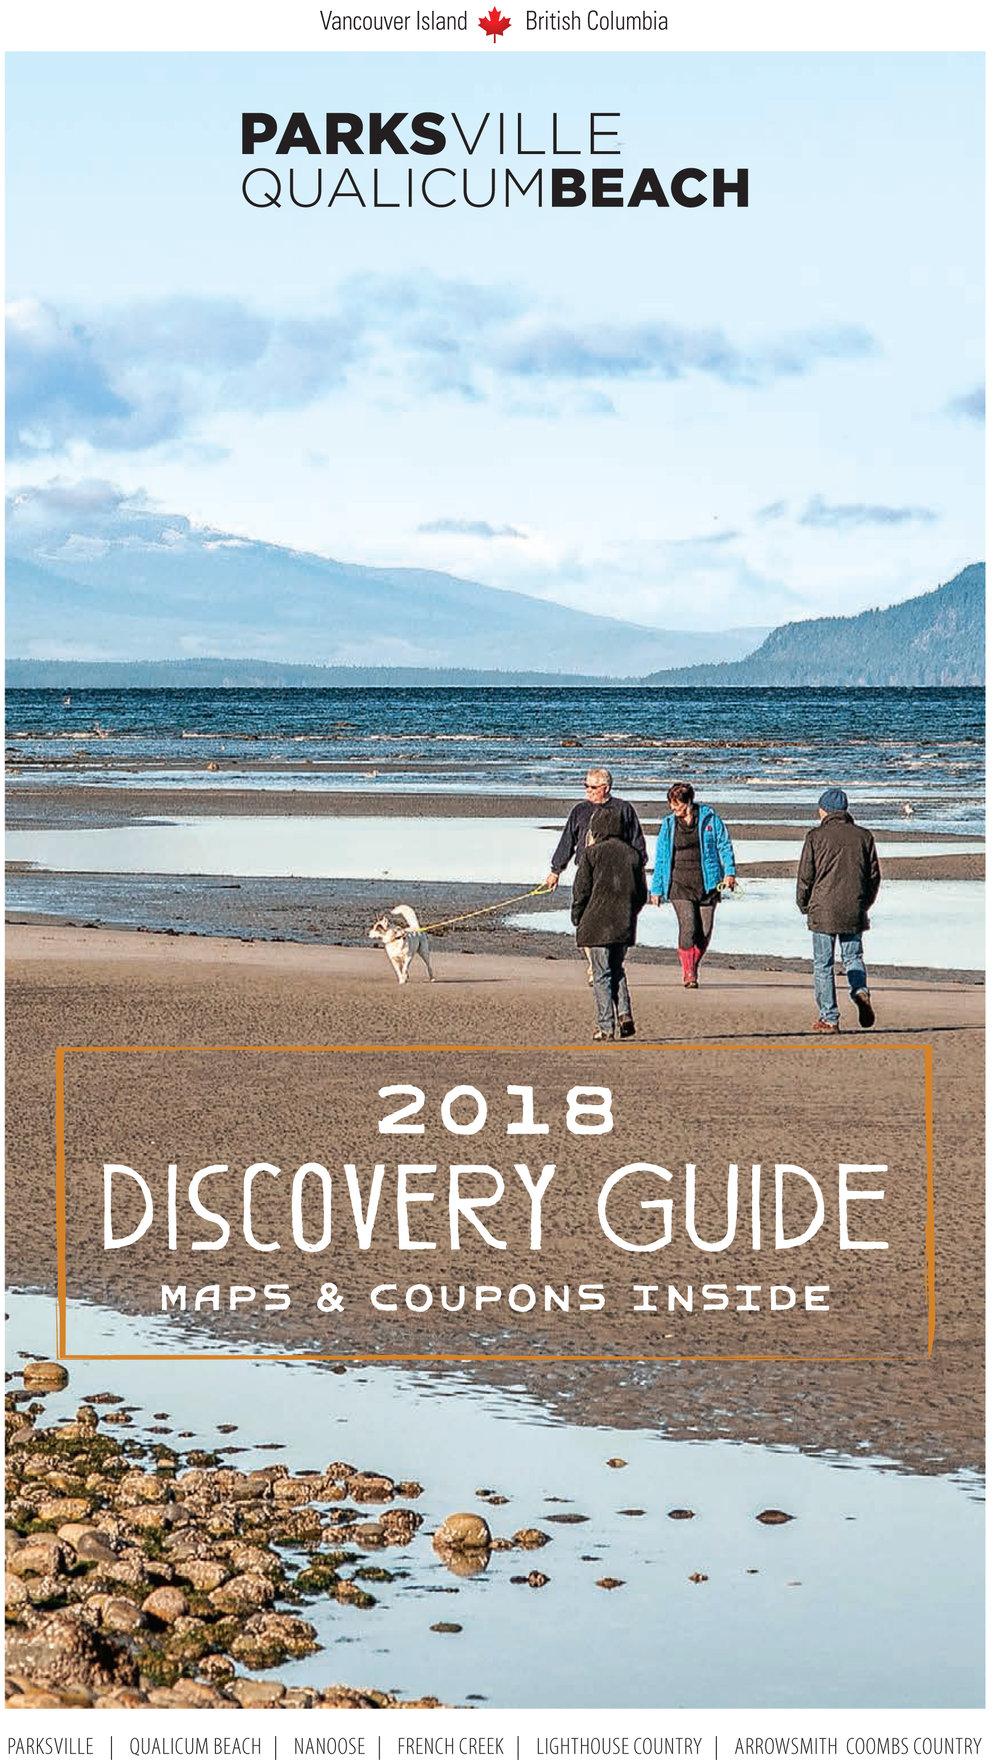 Parksville Qualicum Beach 2018 Discovery Guide.jpg